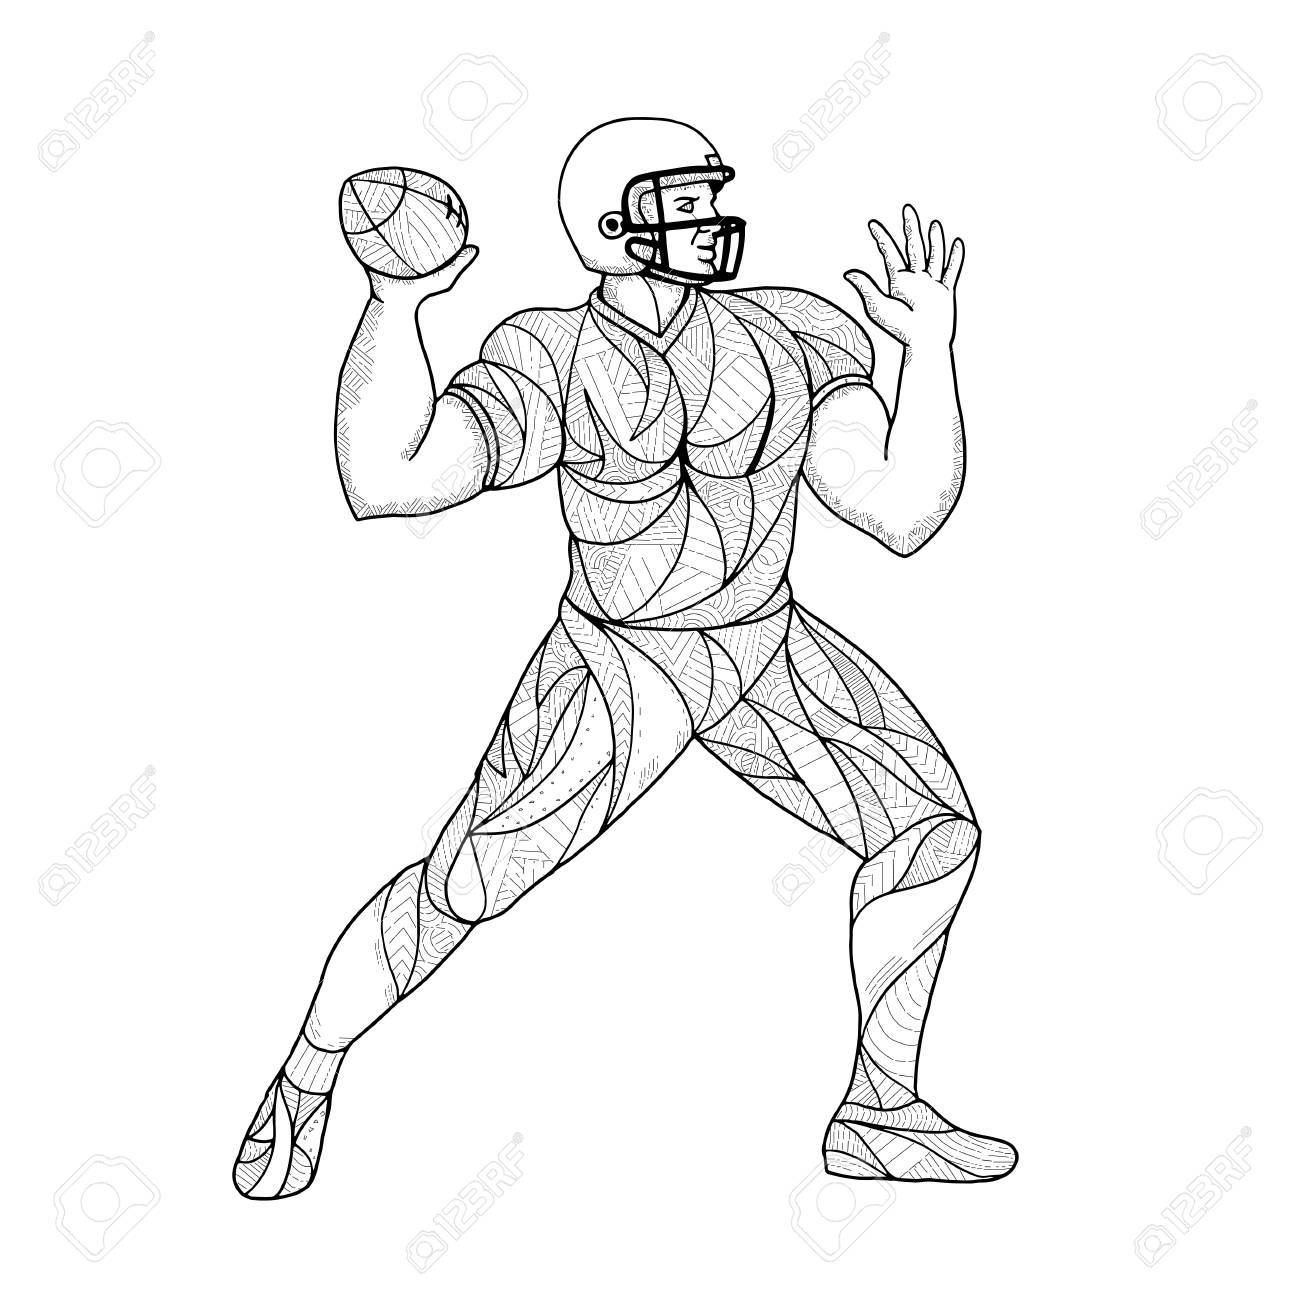 1300x1300 Mandala Illustration Of A Football Player. Ilustraciones